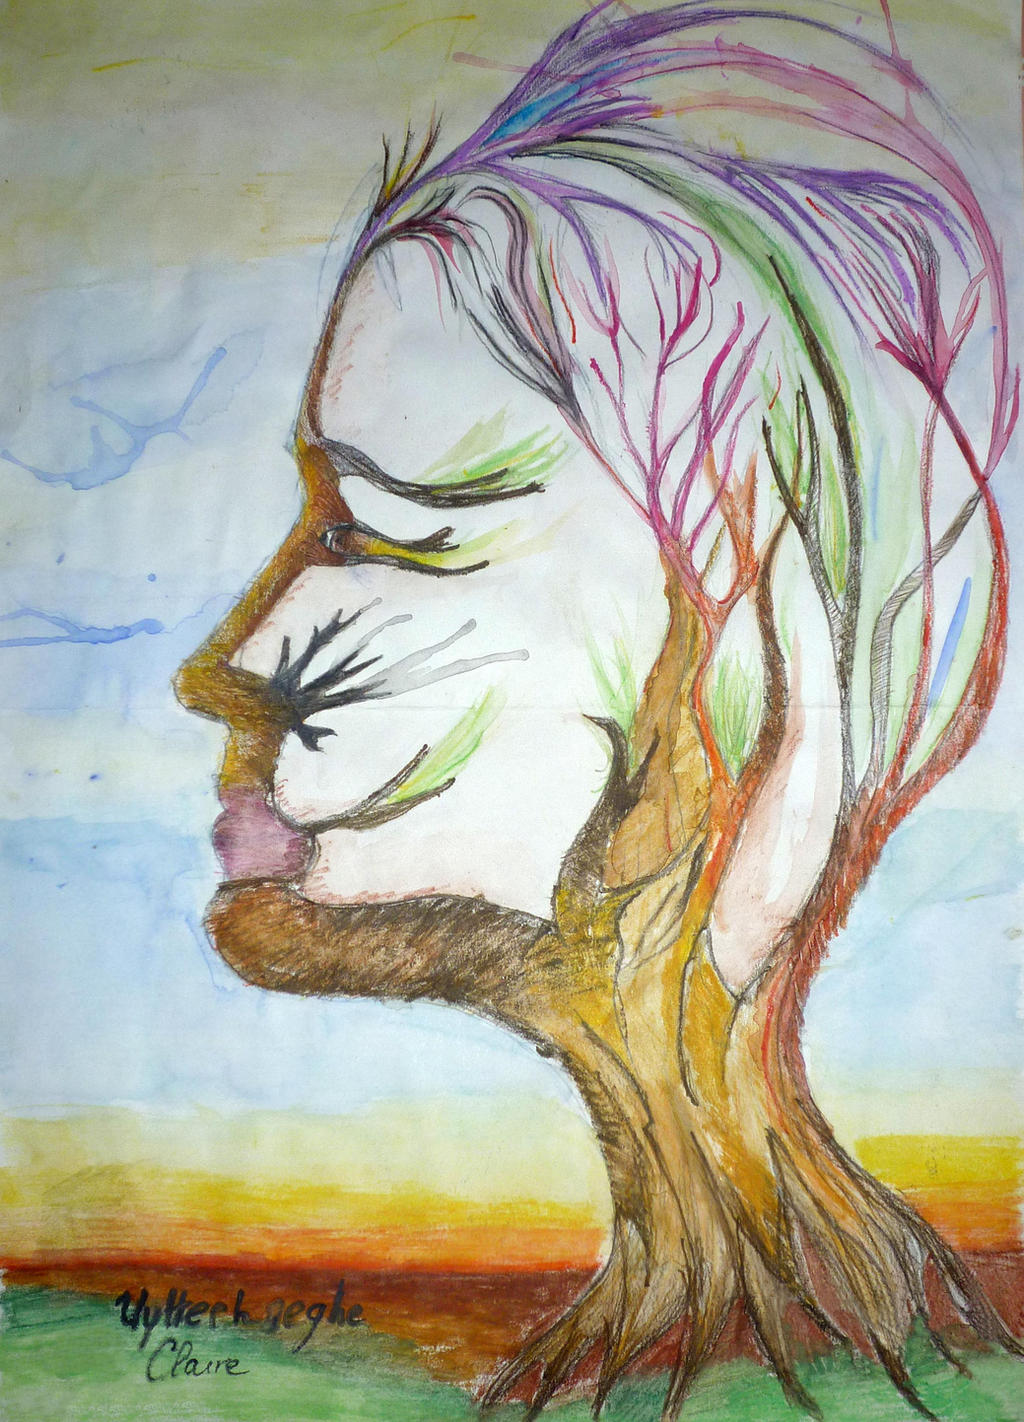 Self portrait tree by erialc15